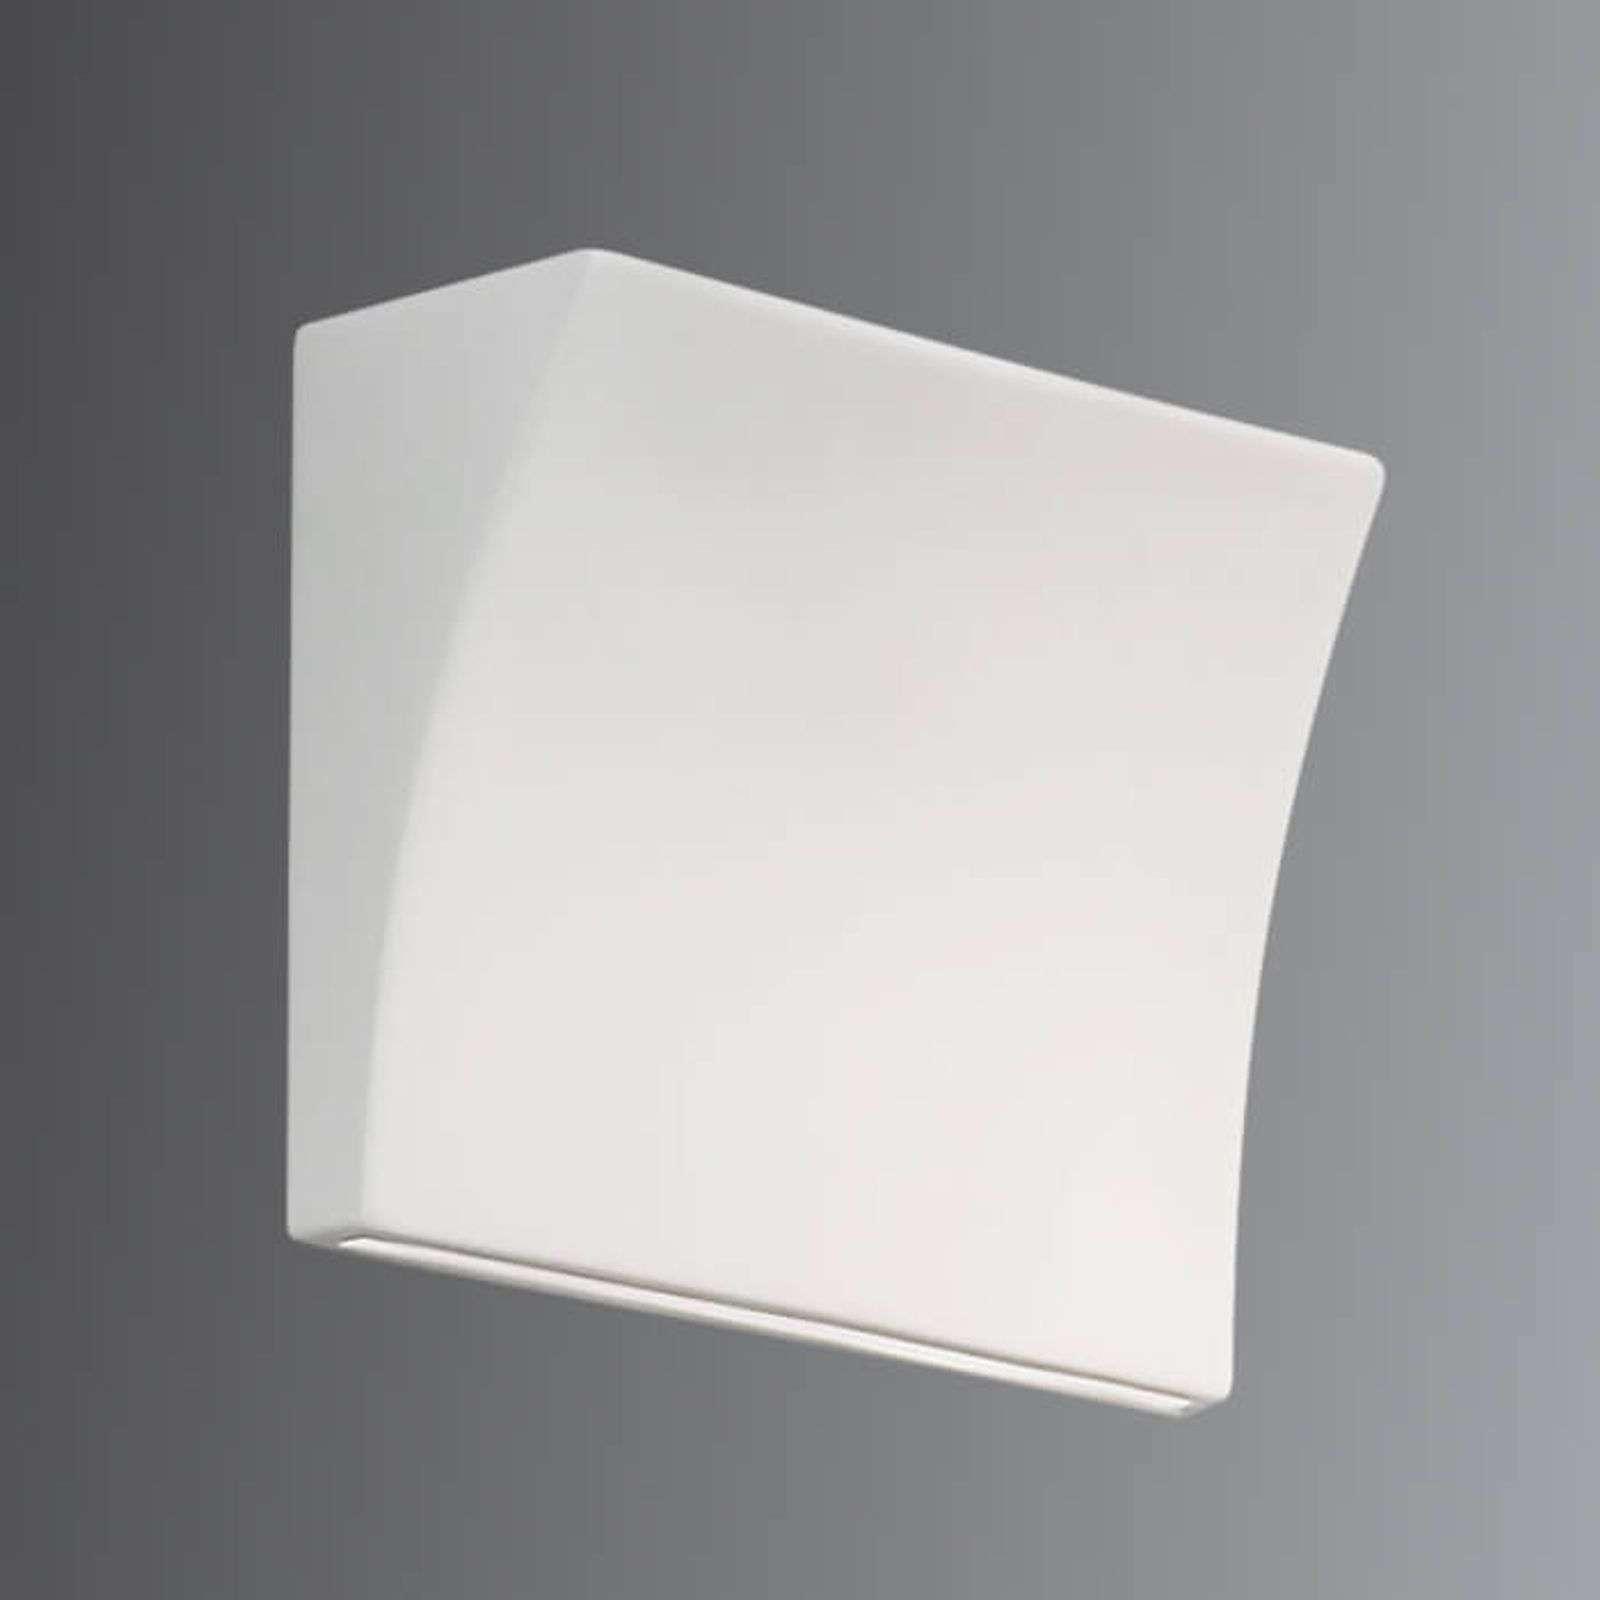 Delon-design-seinävalaisin leveys 18 cm